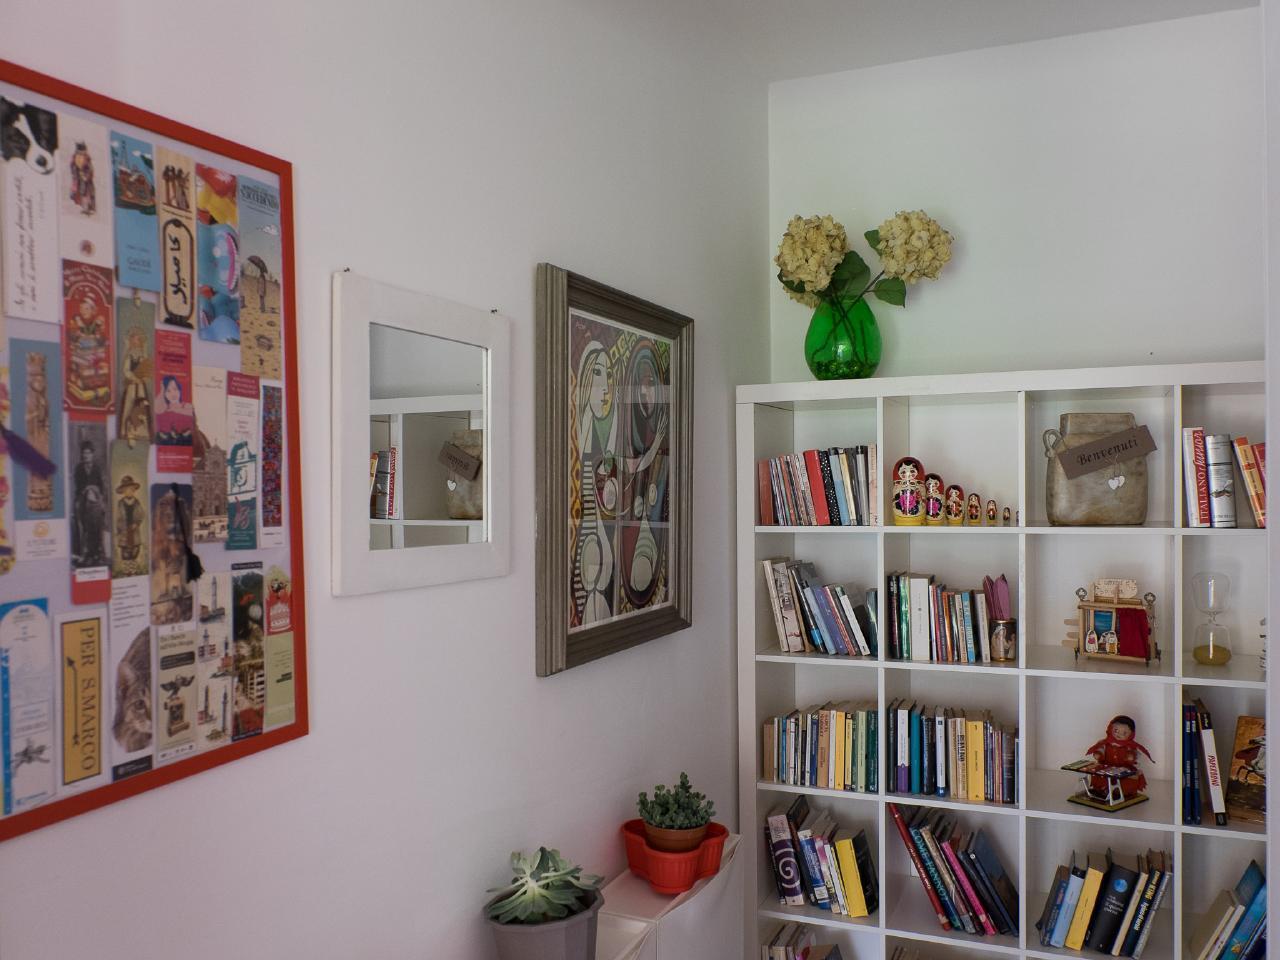 Ferienhaus Beim Schriftsteller zu Hause (2655674), Matera, Matera, Basilikata, Italien, Bild 3